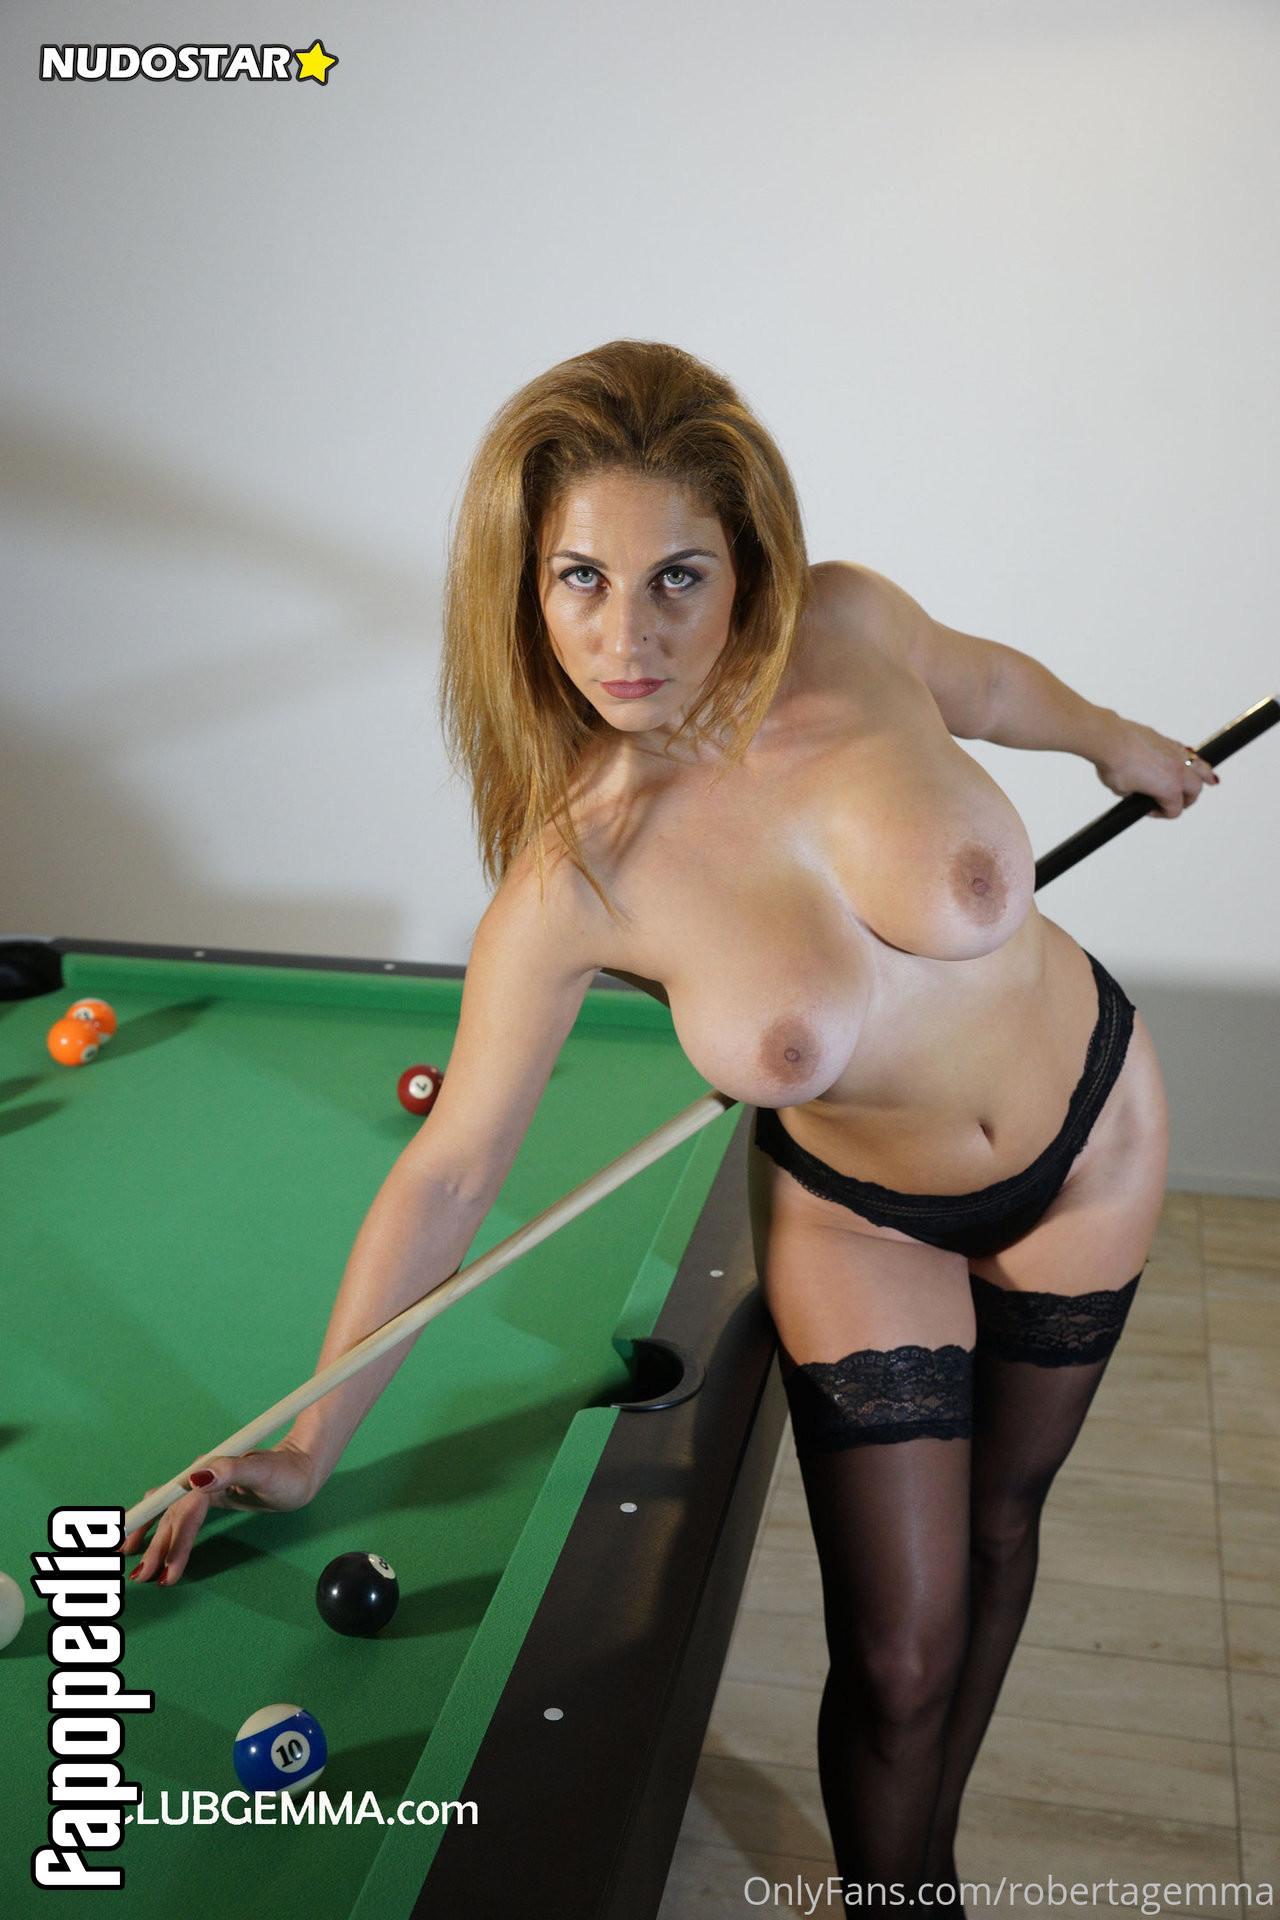 Gemma nude roberta Nude Roberta